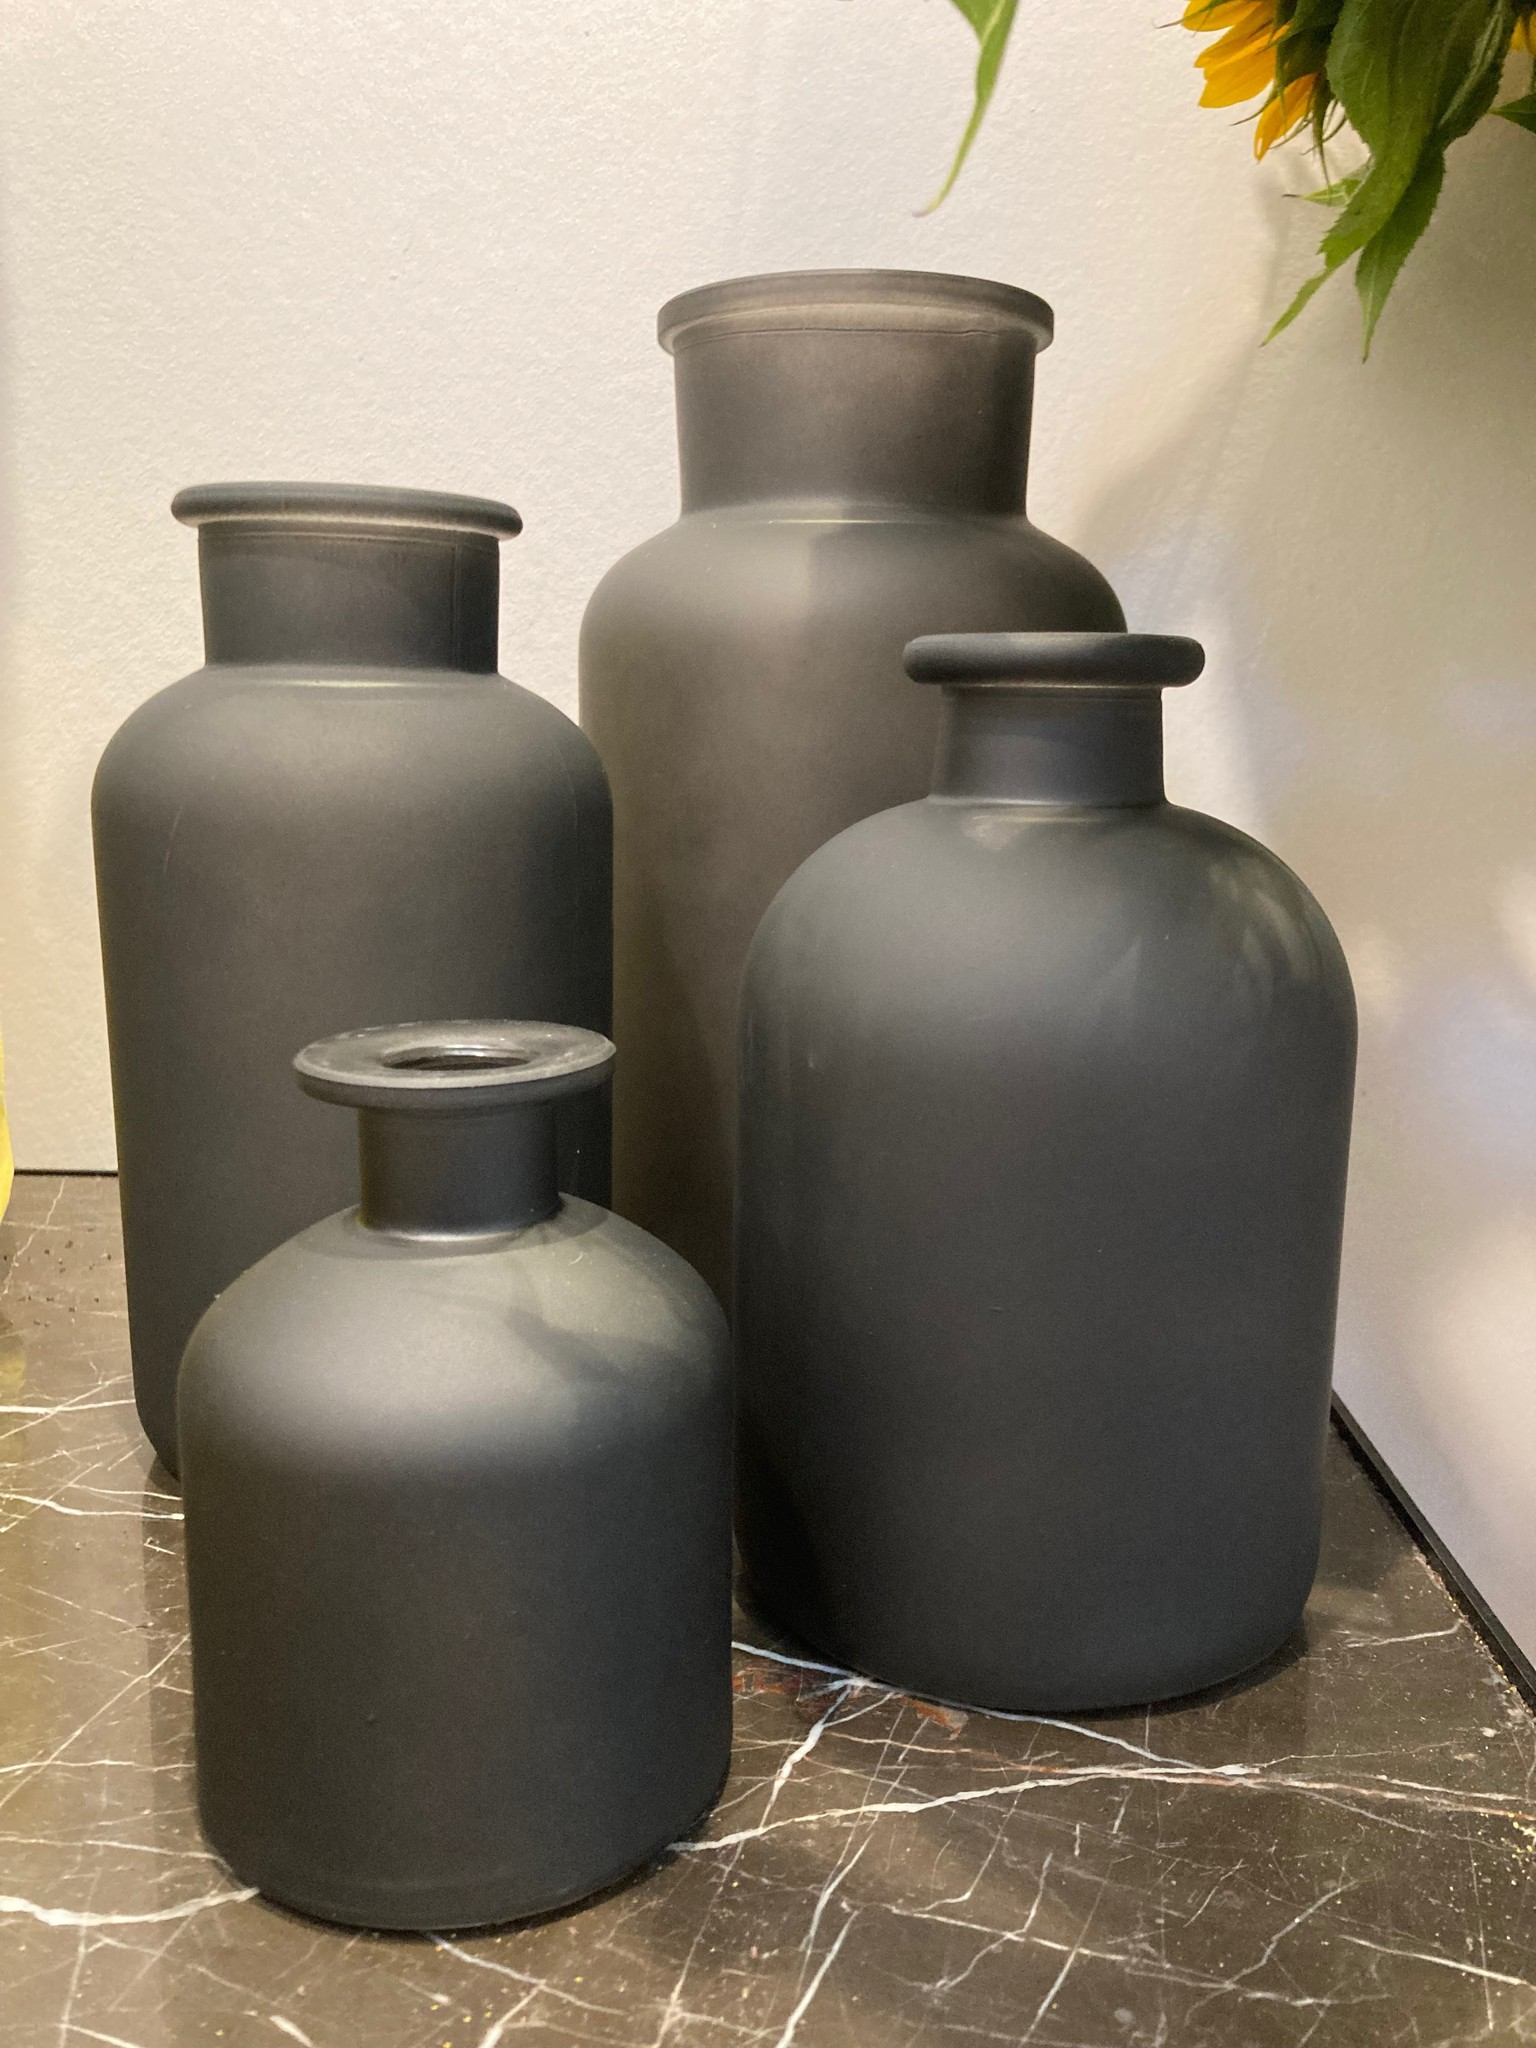 Dray glass black mat melkbus 10x20cm